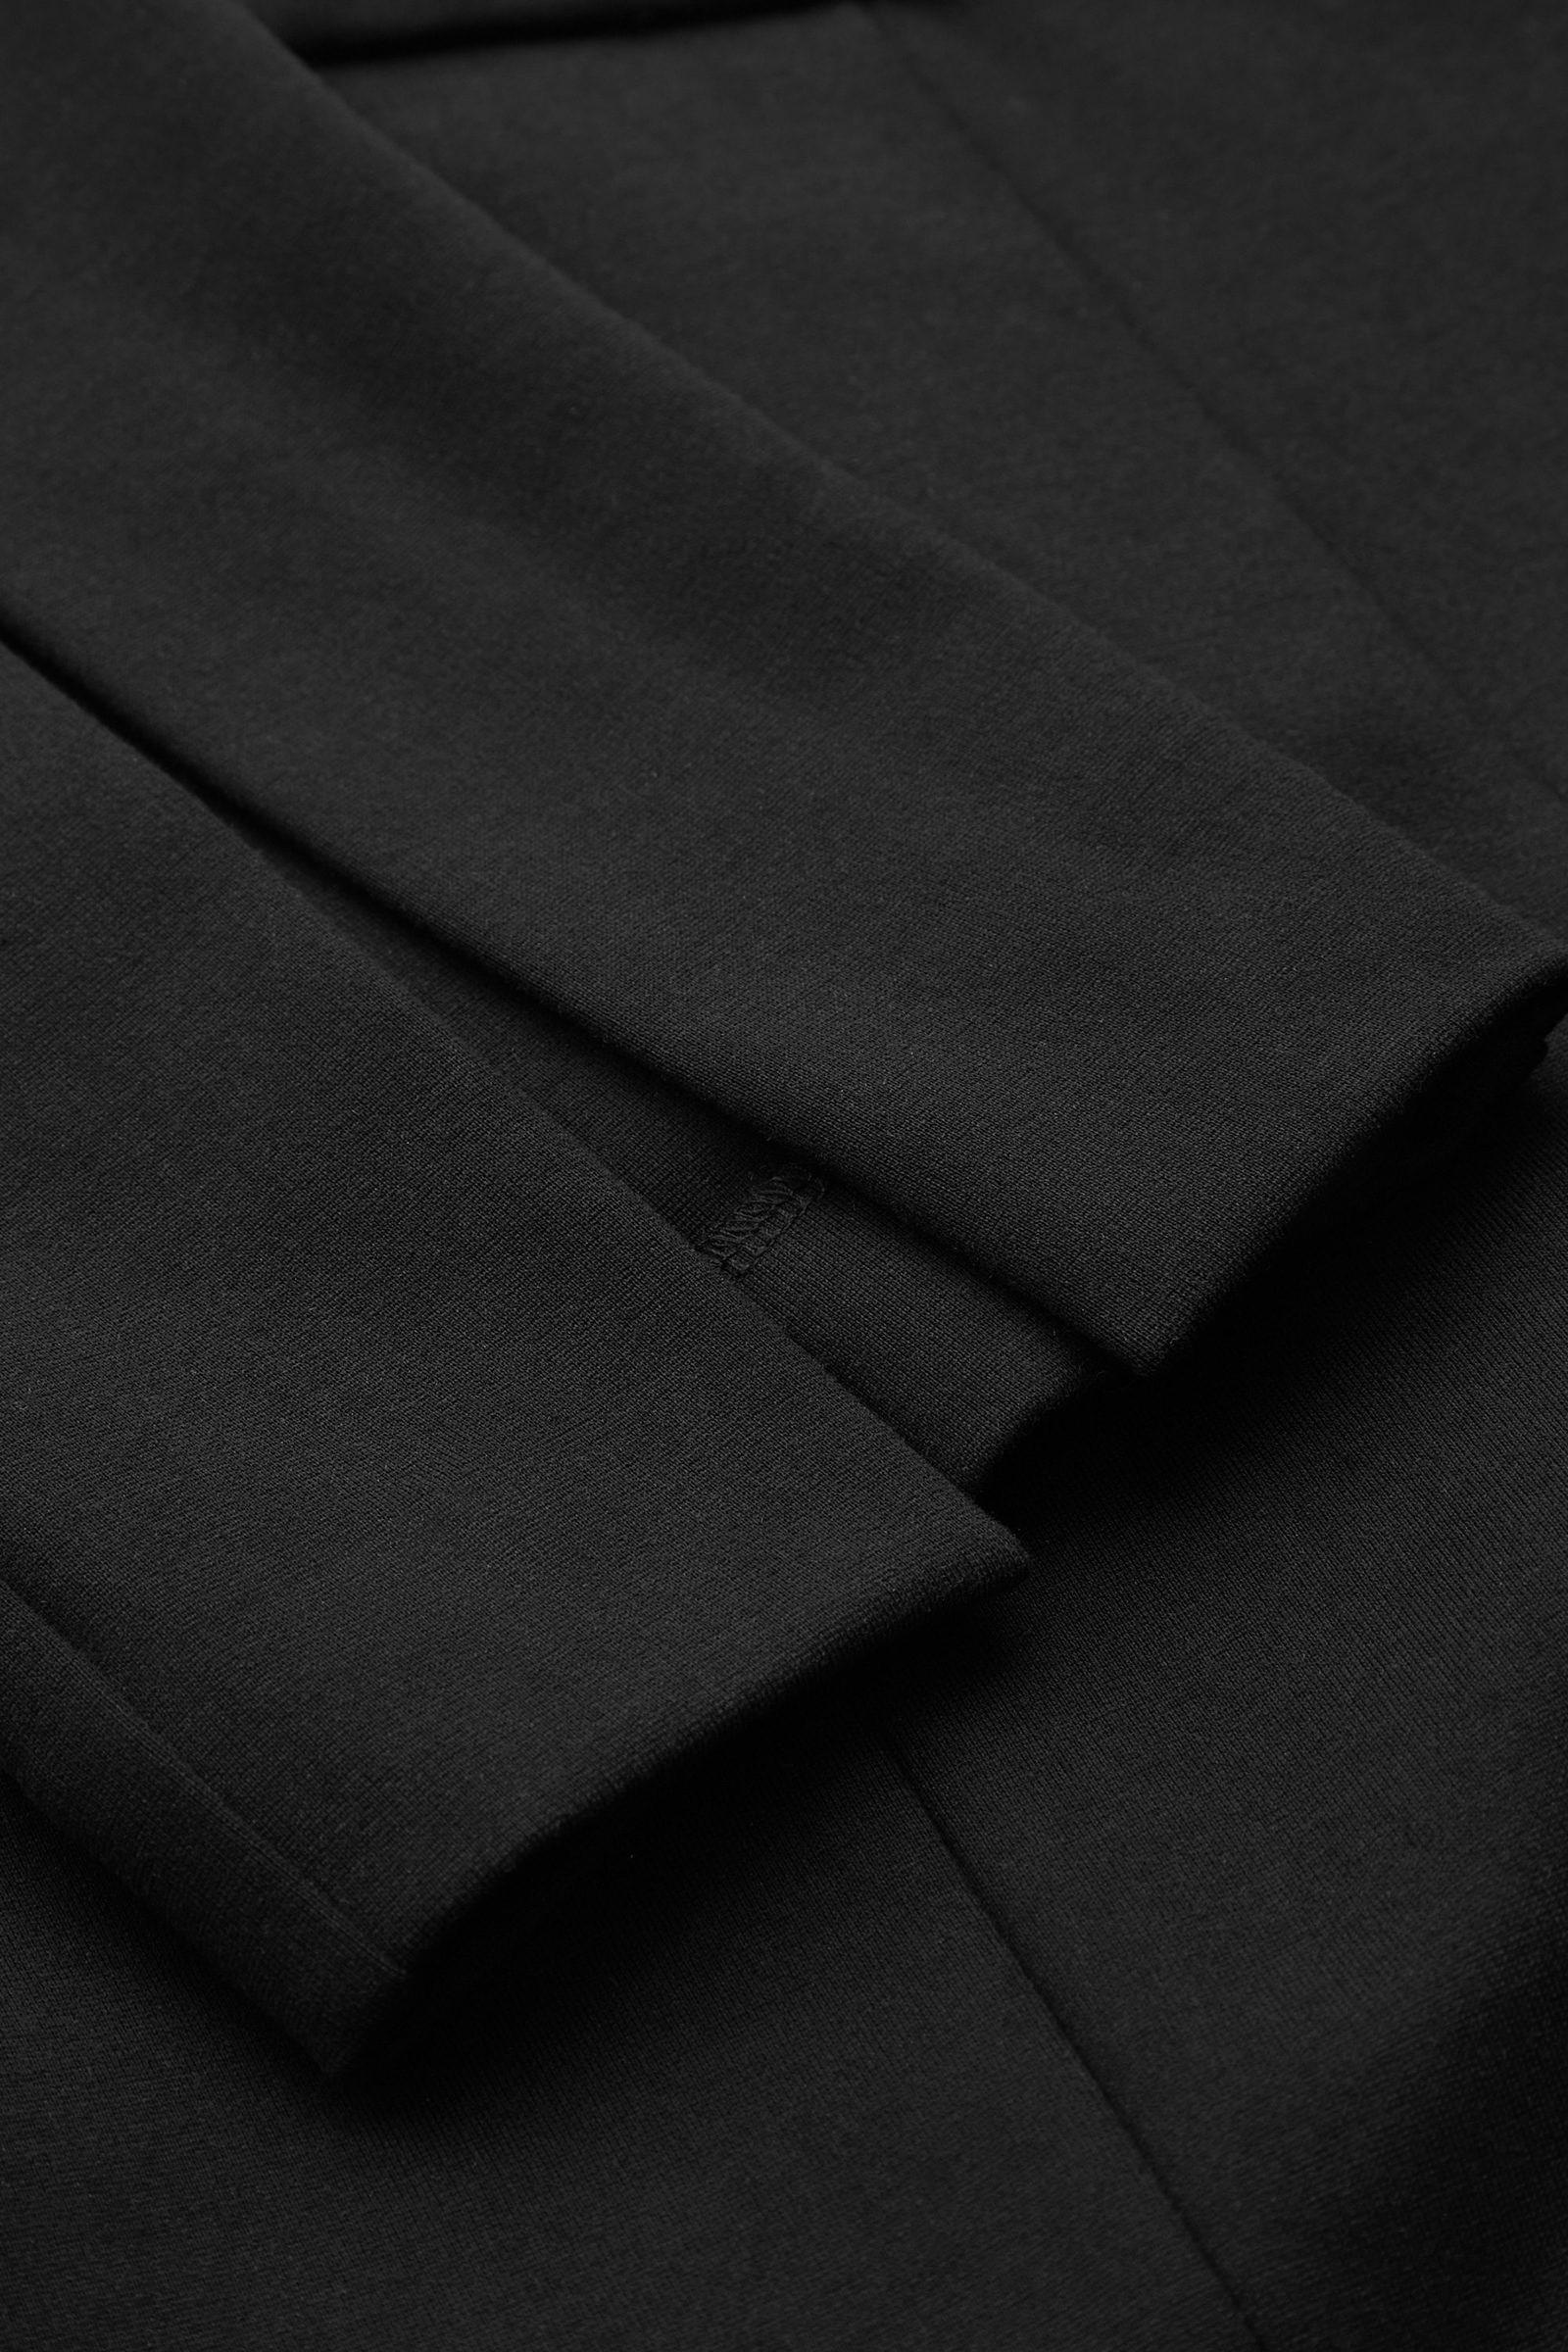 COS 슬림 핏 트라우저의 블랙컬러 Detail입니다.